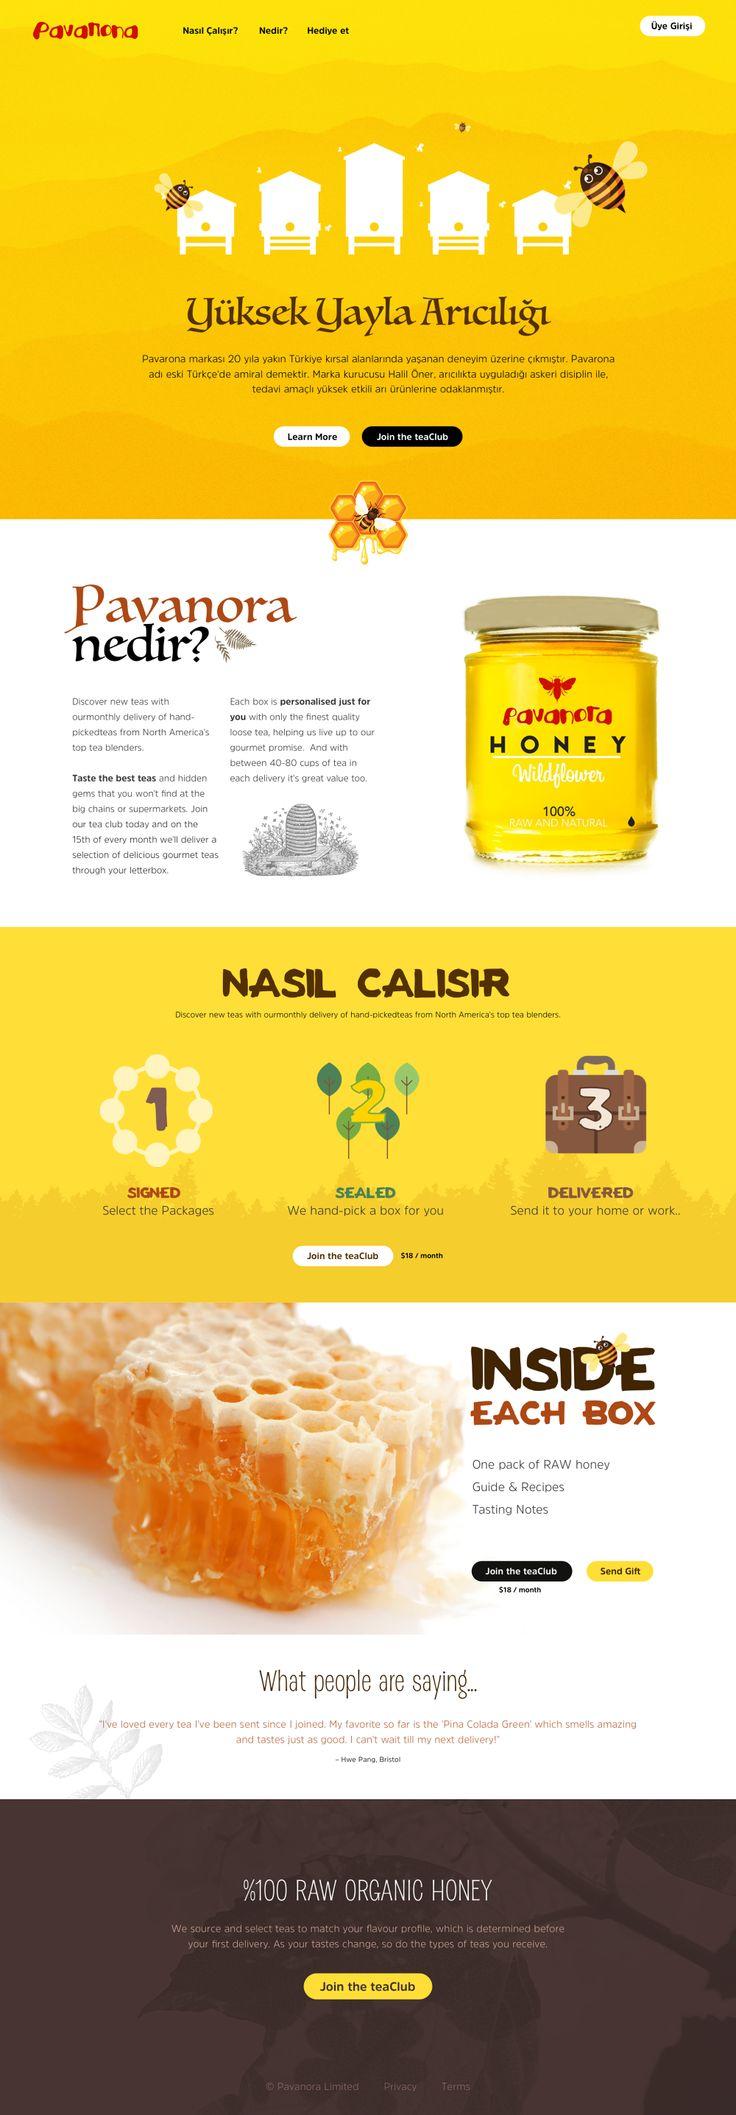 onepage website design